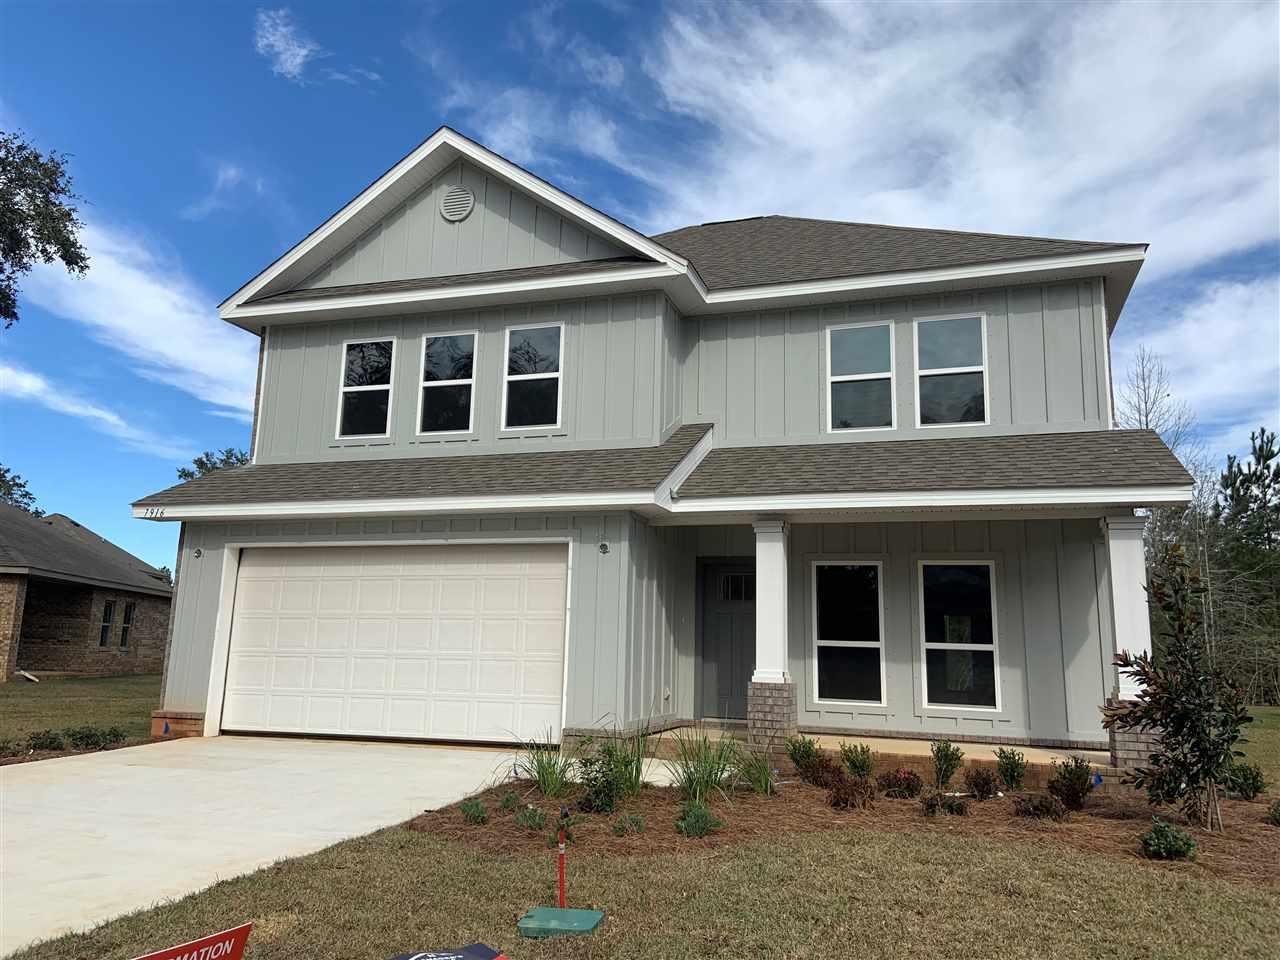 7916 Huntington Creek Ln, Pensacola, FL 32526